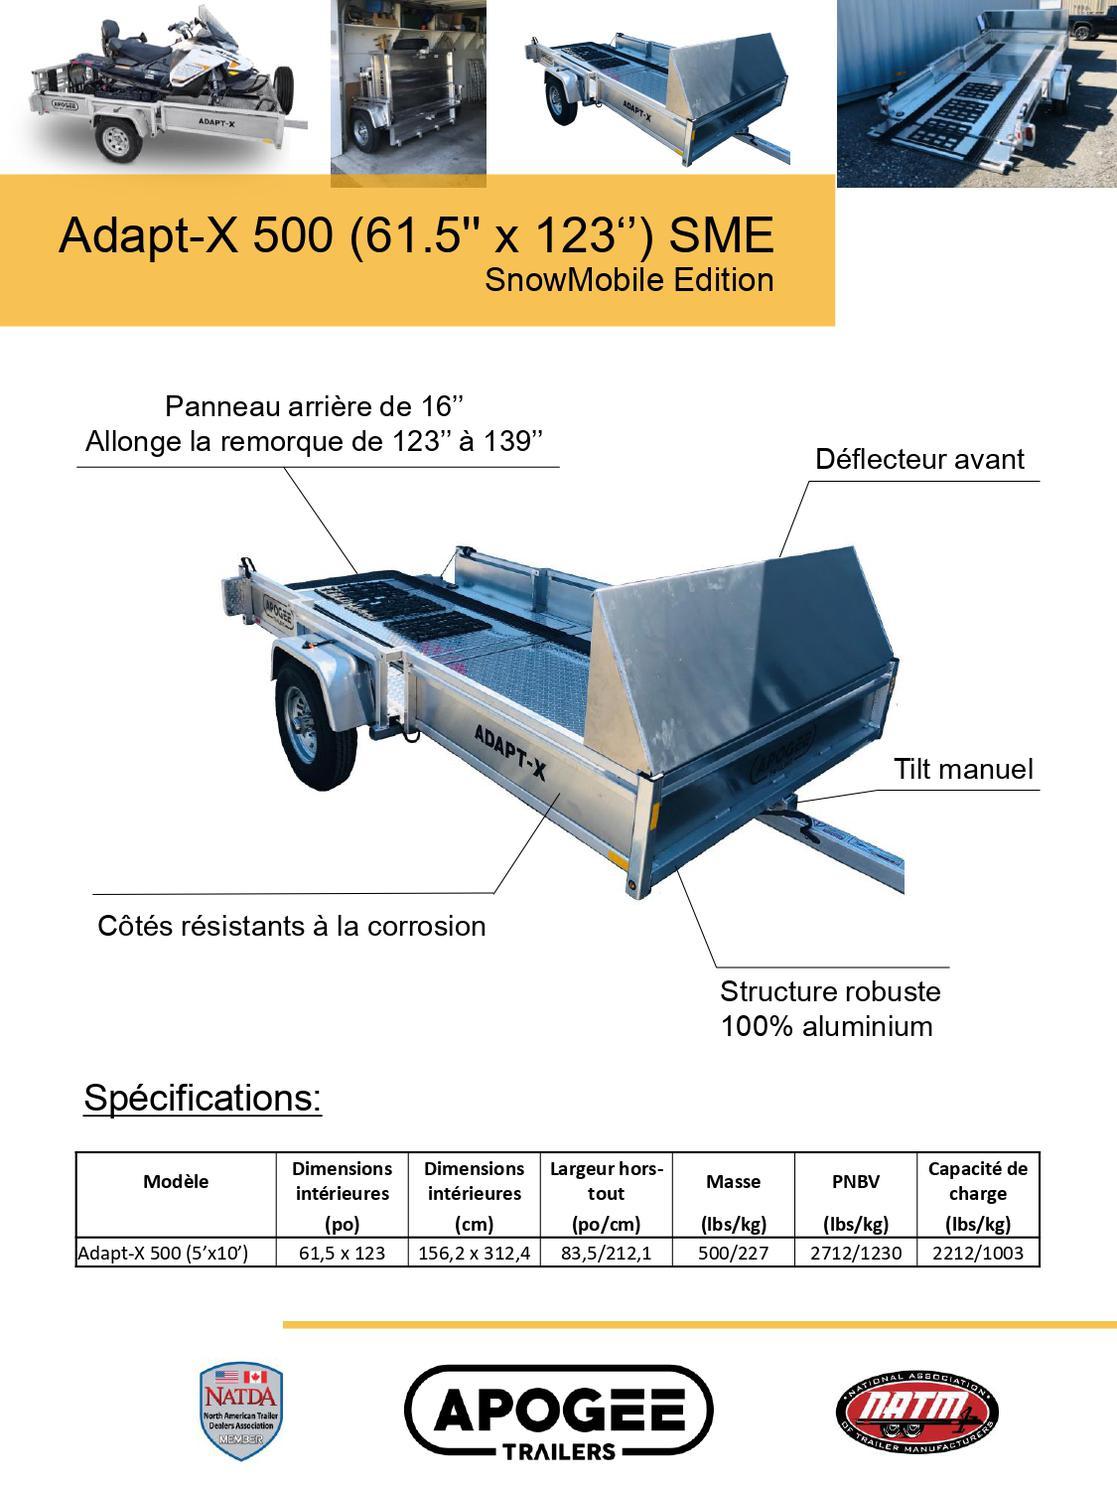 Apogee Remorque ADAPT-X 500 SME 2021